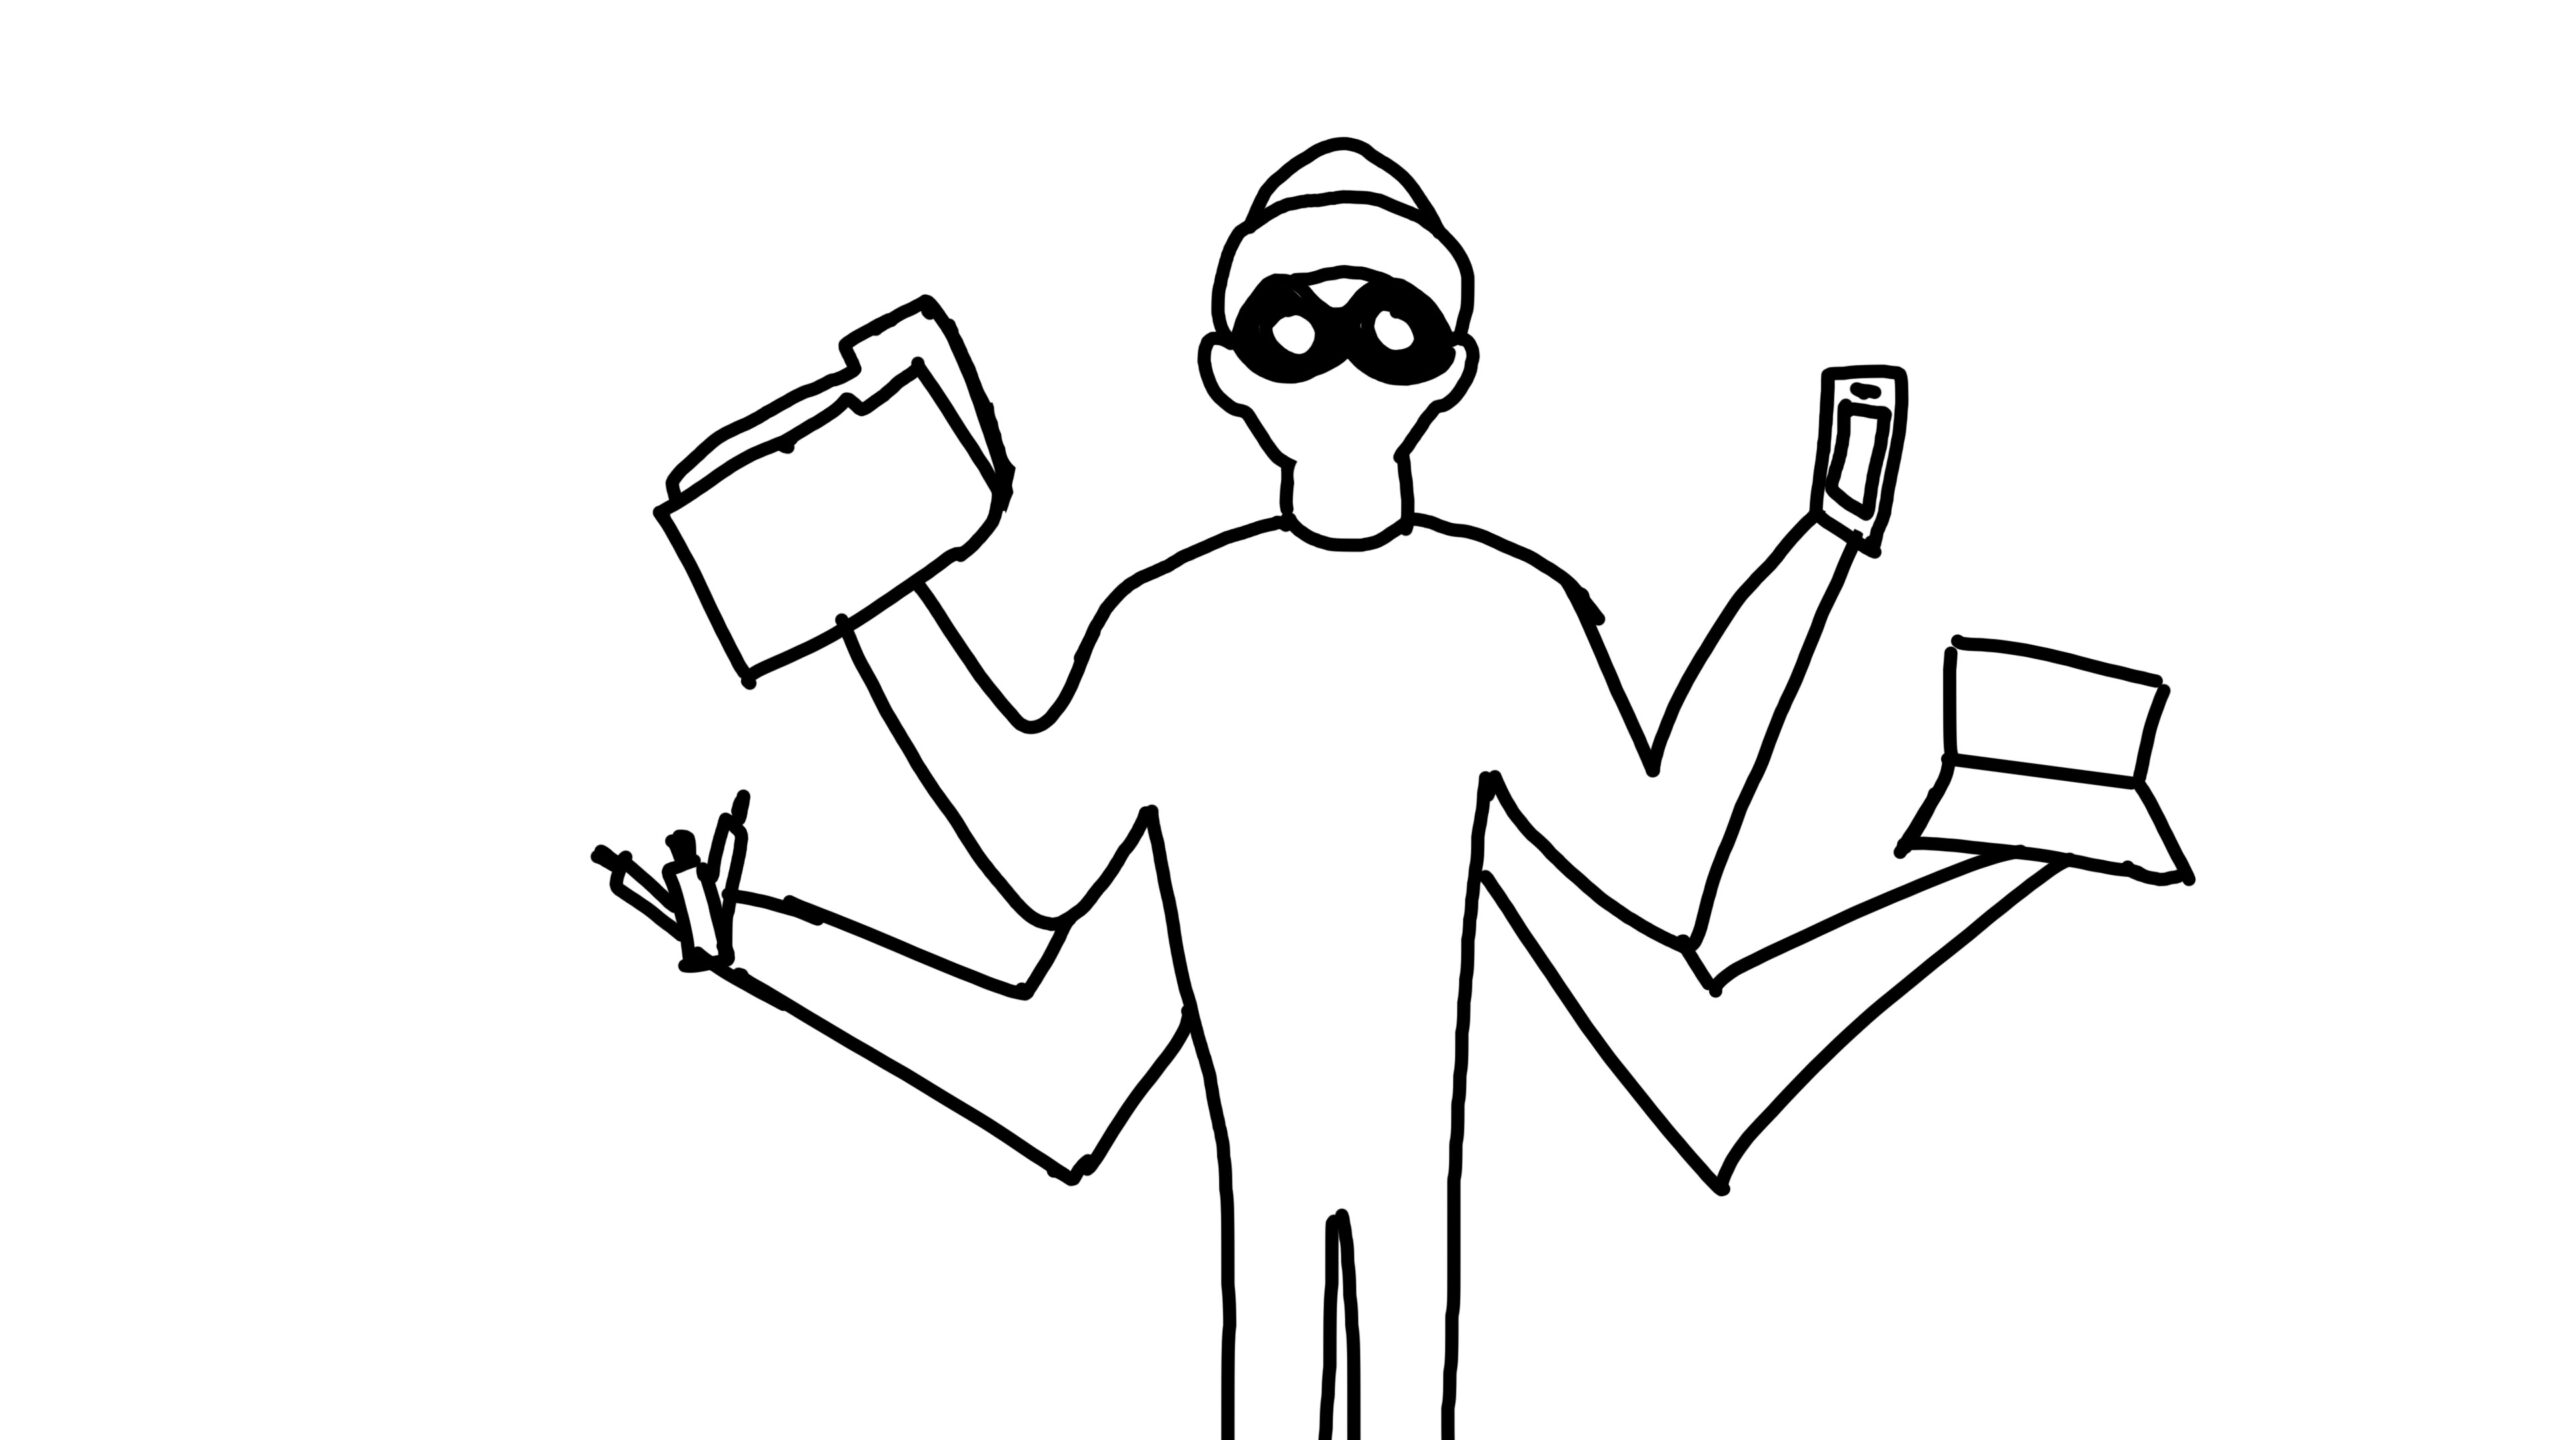 Privacy_Incident_Sketchboard_0308